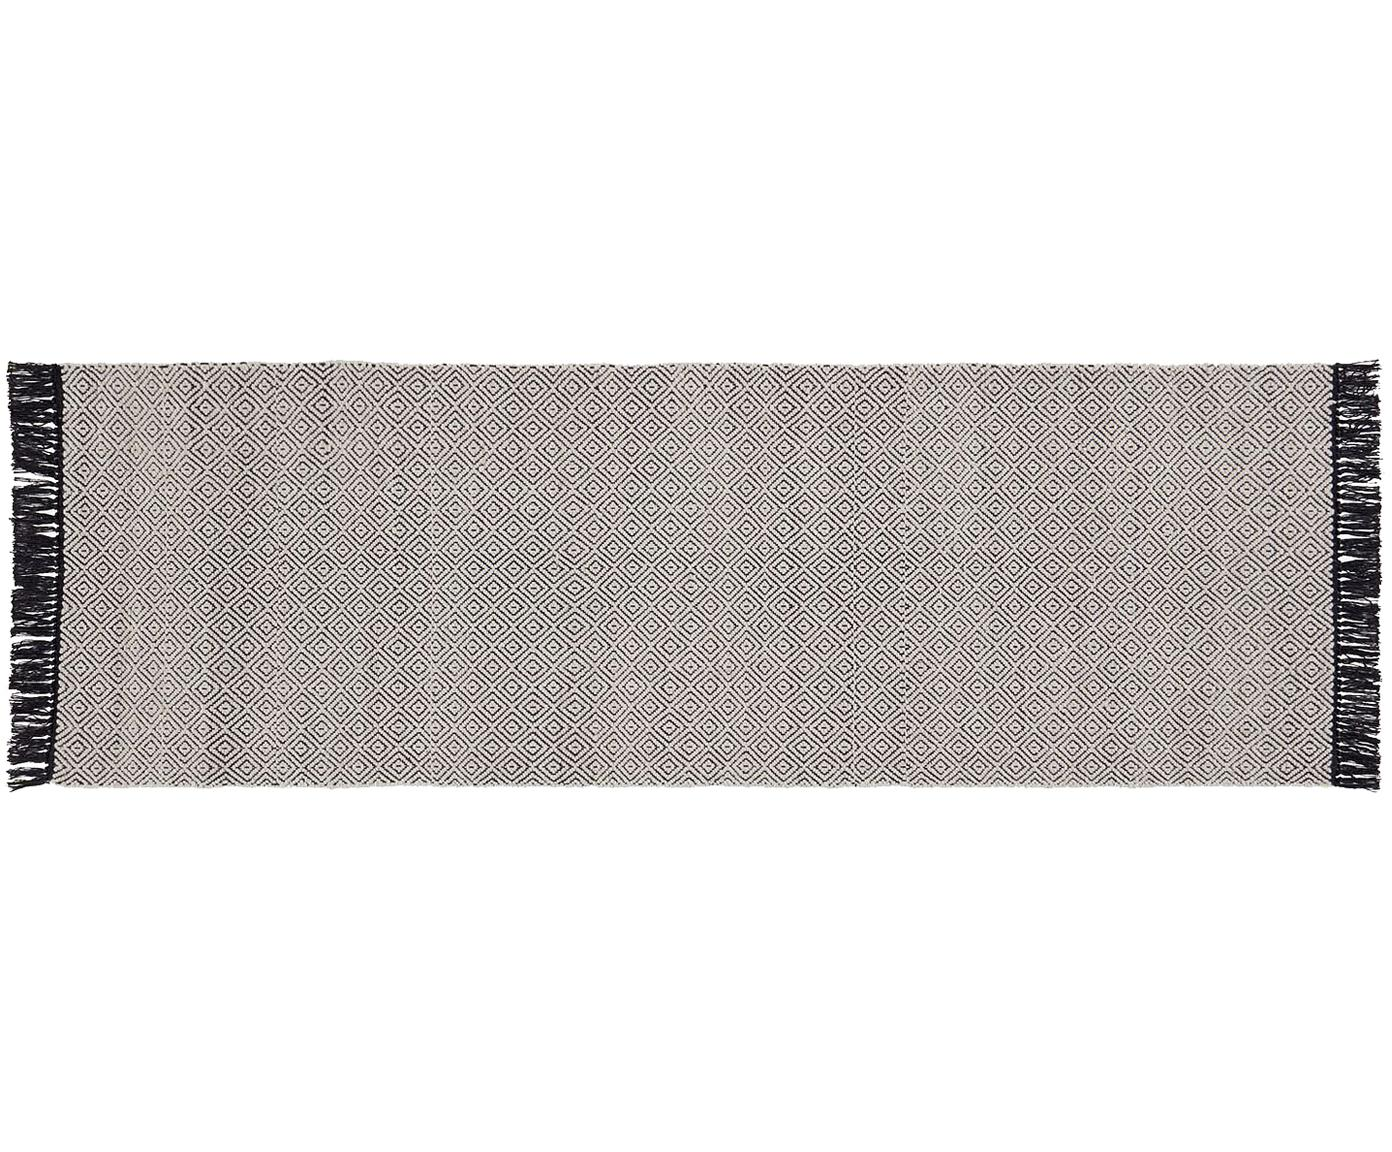 Loper Todos met grafisch patroon, 40% katoen, 30% wol, 30% polyester, Greige, 80 x 250 cm